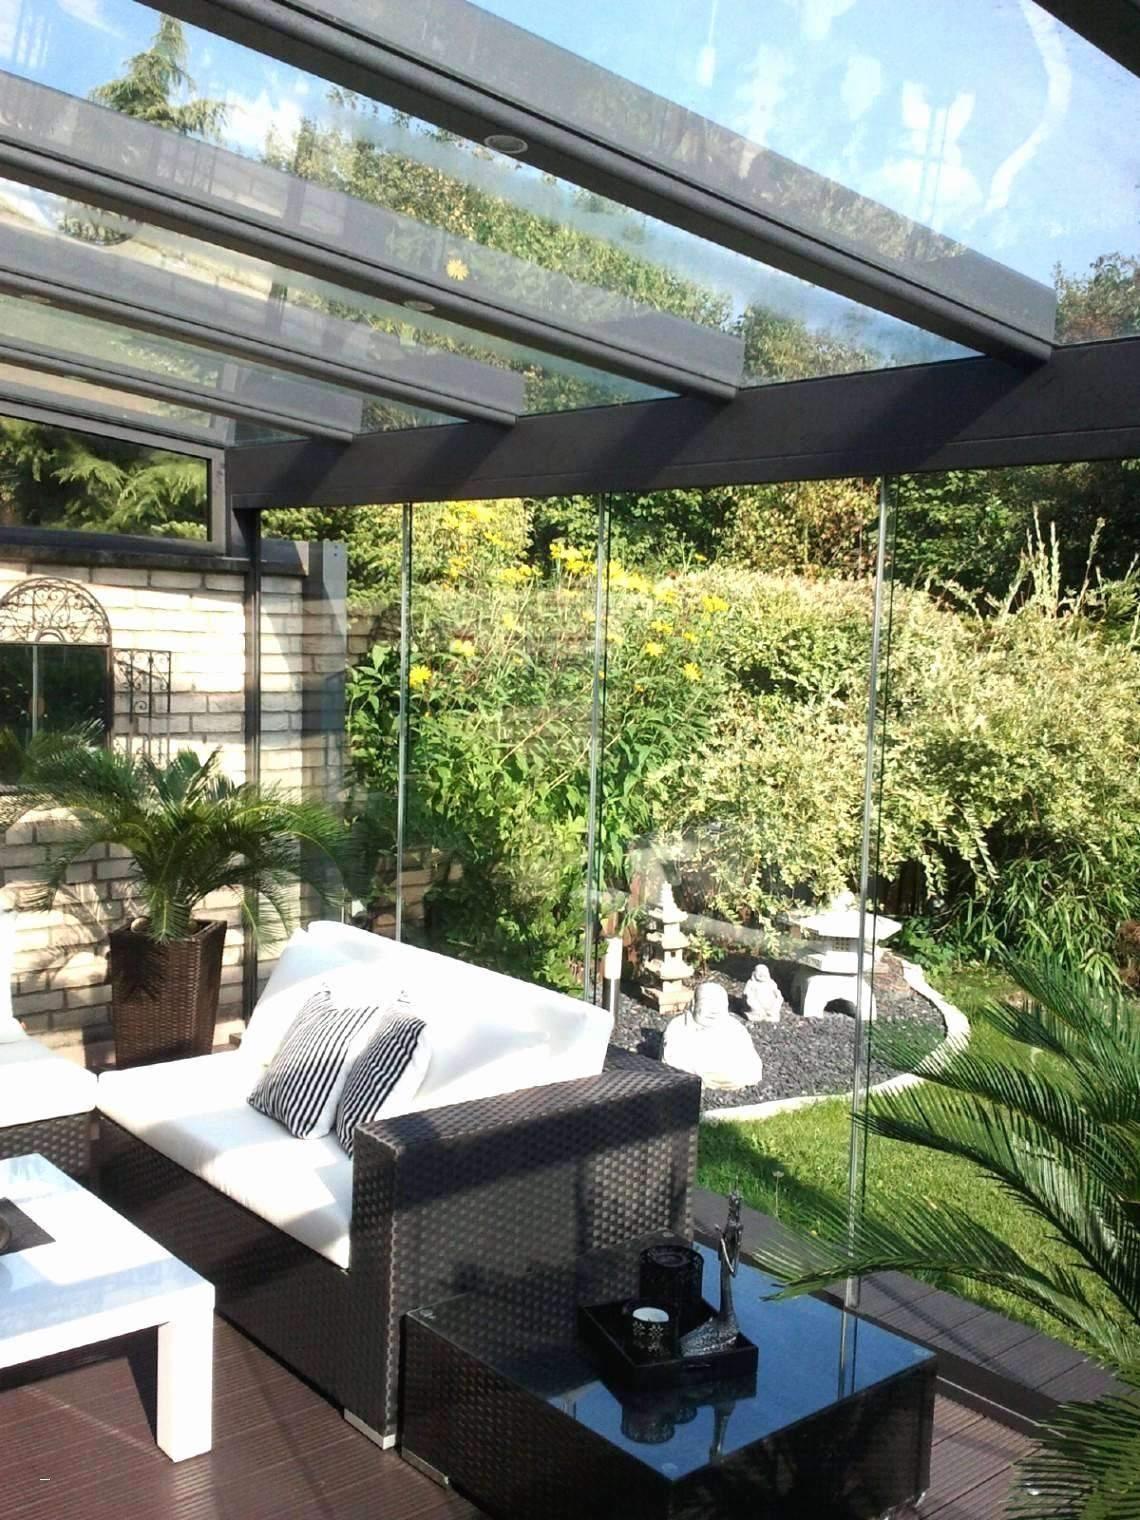 garten terrasse ideen schon kleingarten gestalten ideen of garten terrasse ideen